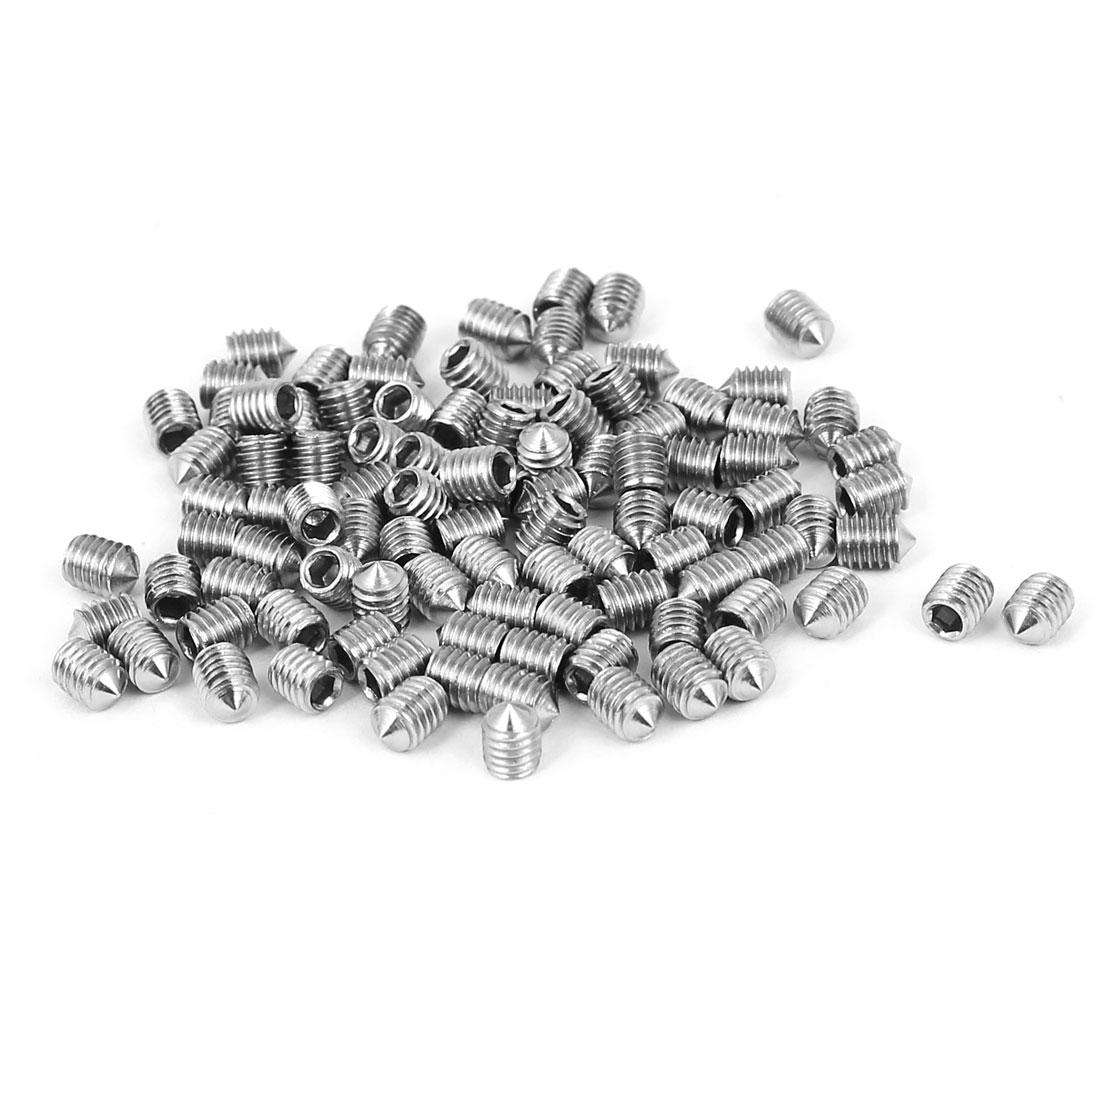 M3x4mm Stainless Steel Cone Point Hexagon Socket Grub Screws 100pcs